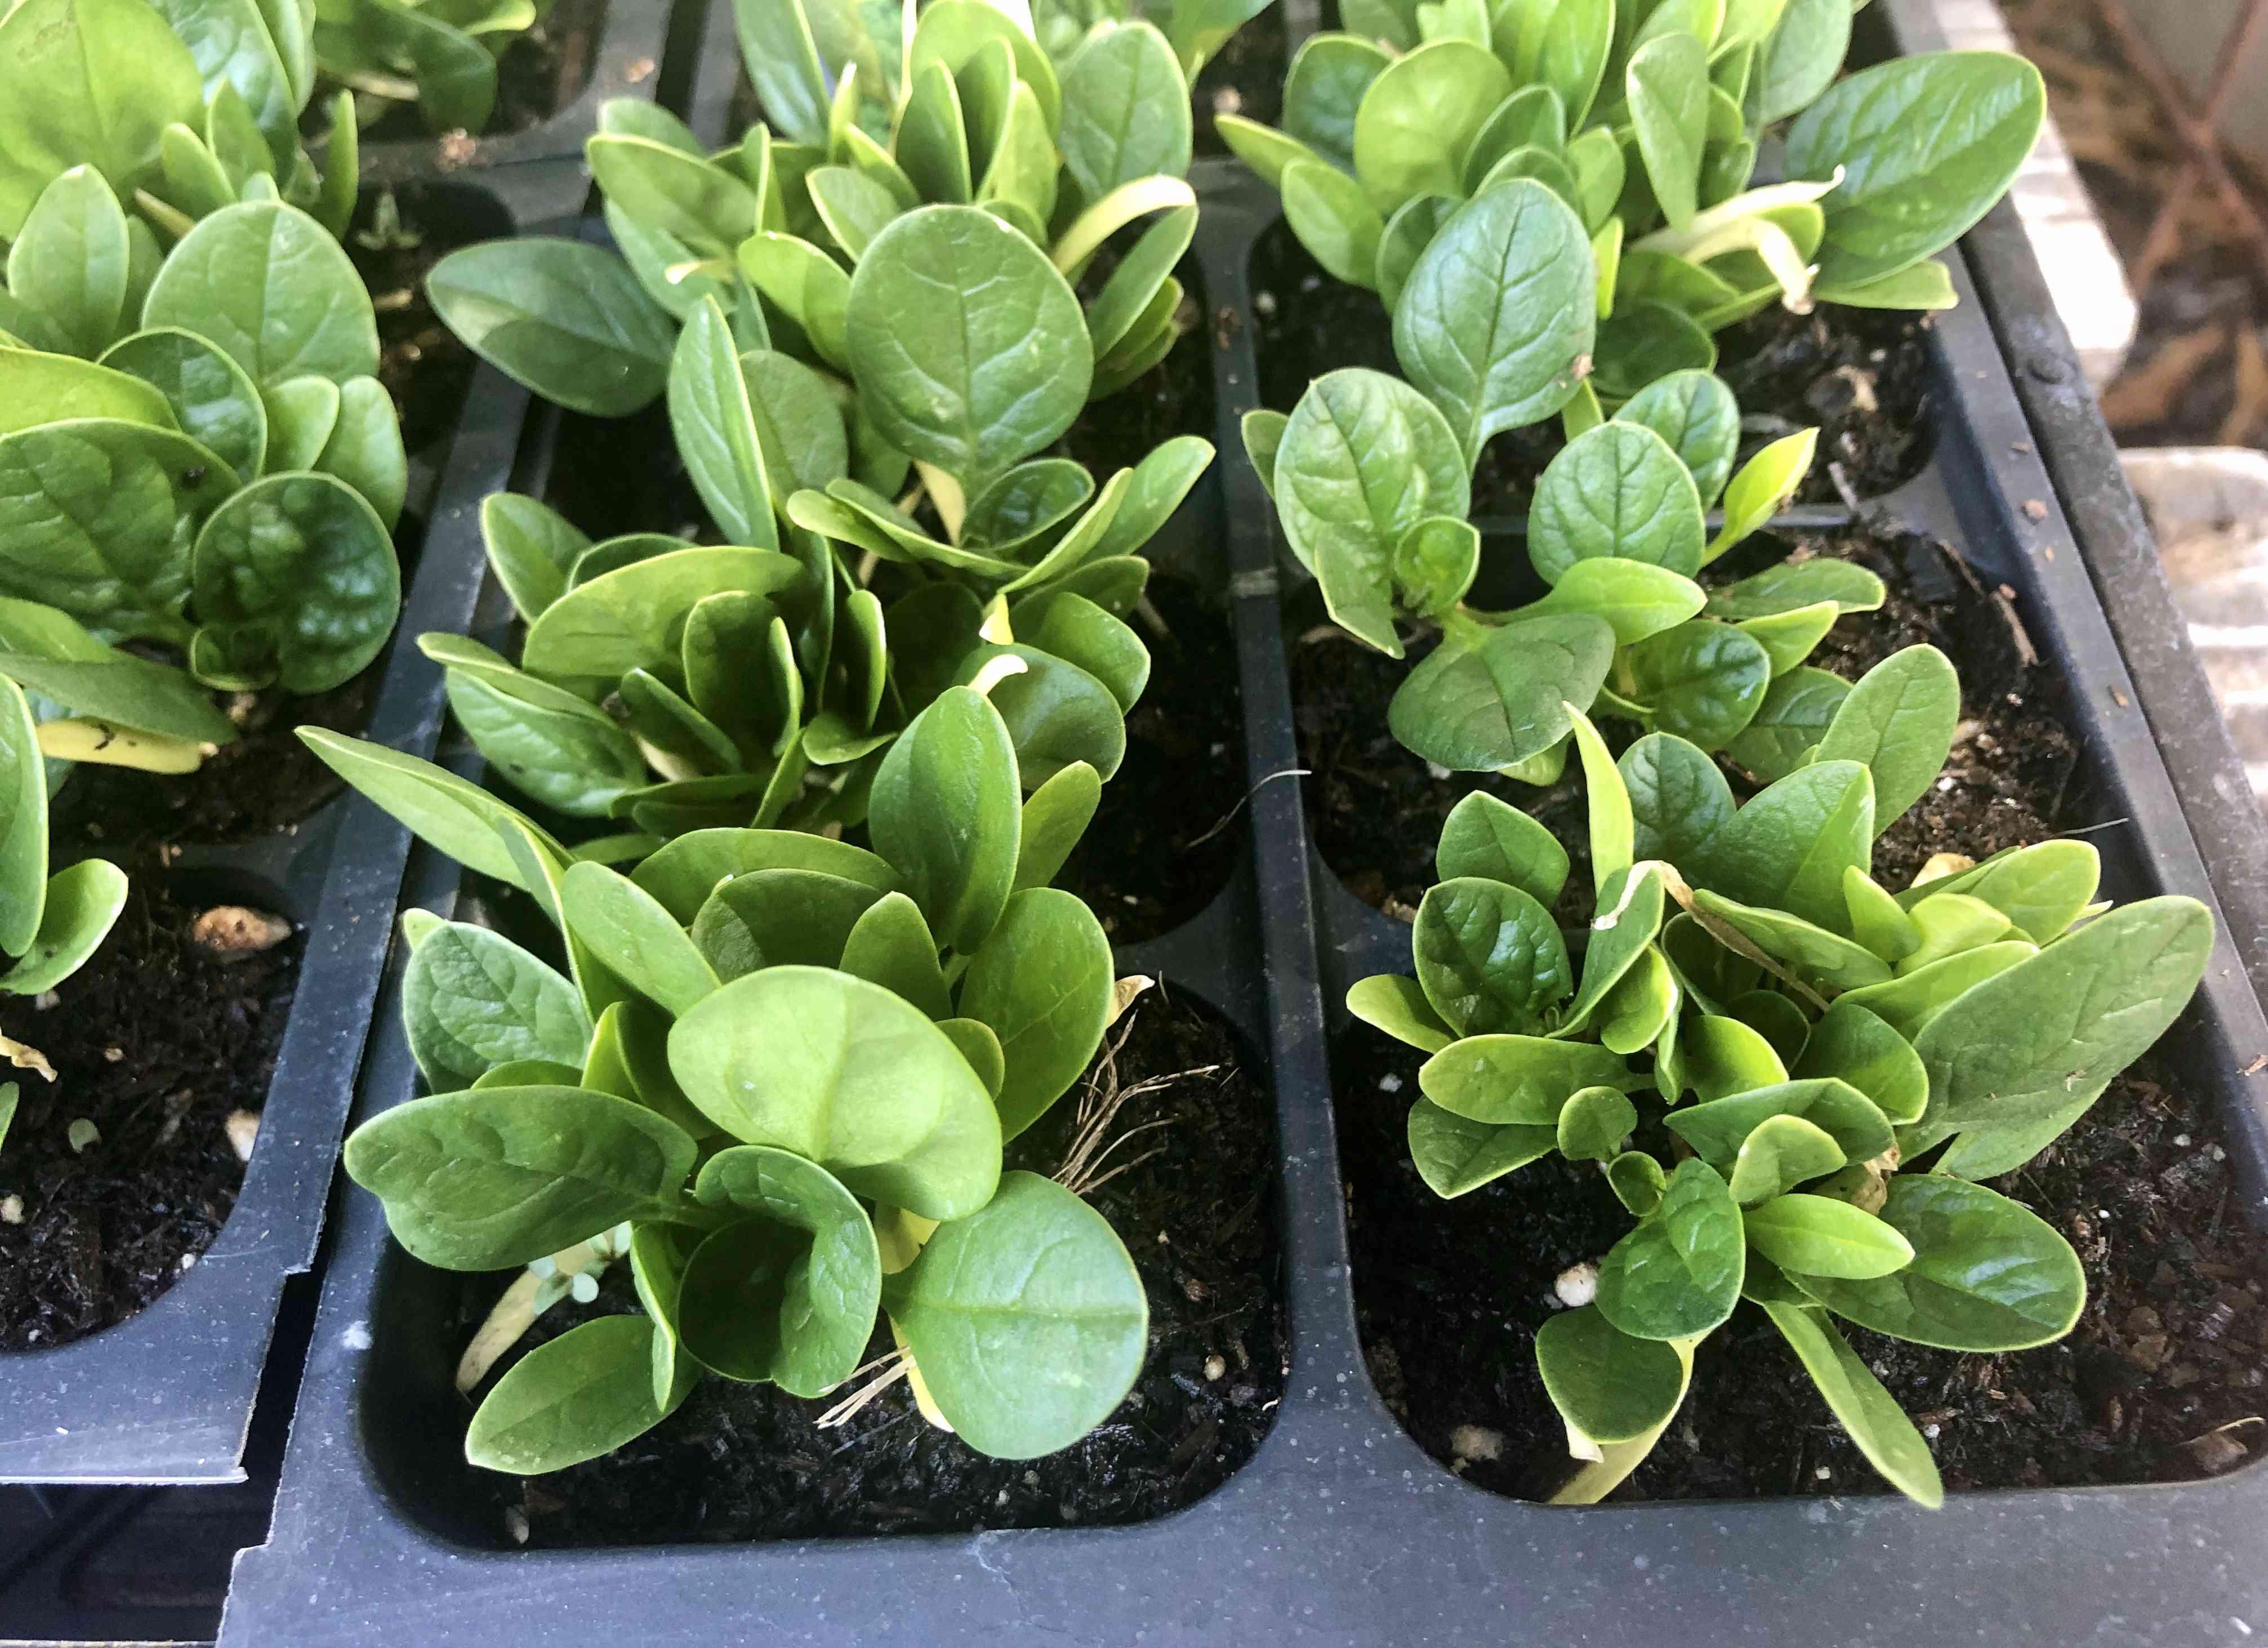 Spinach heads